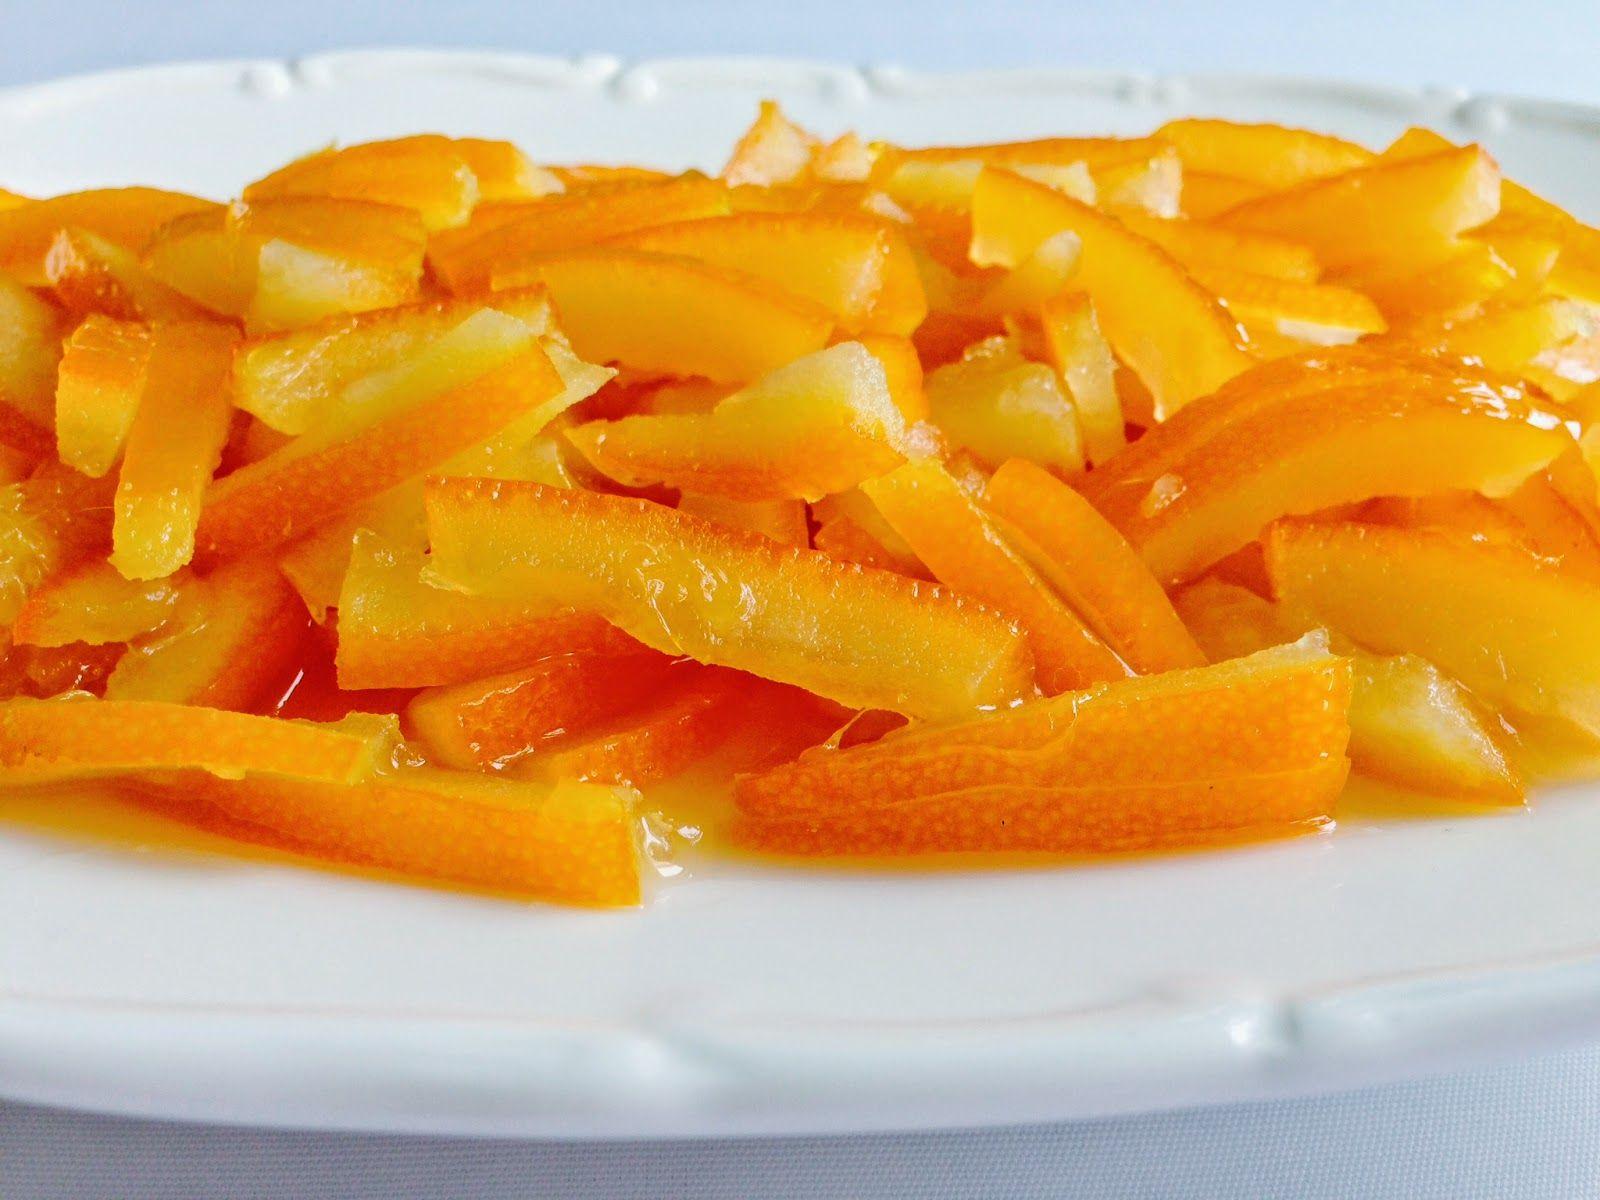 Portakal Kabuğu Reçeli